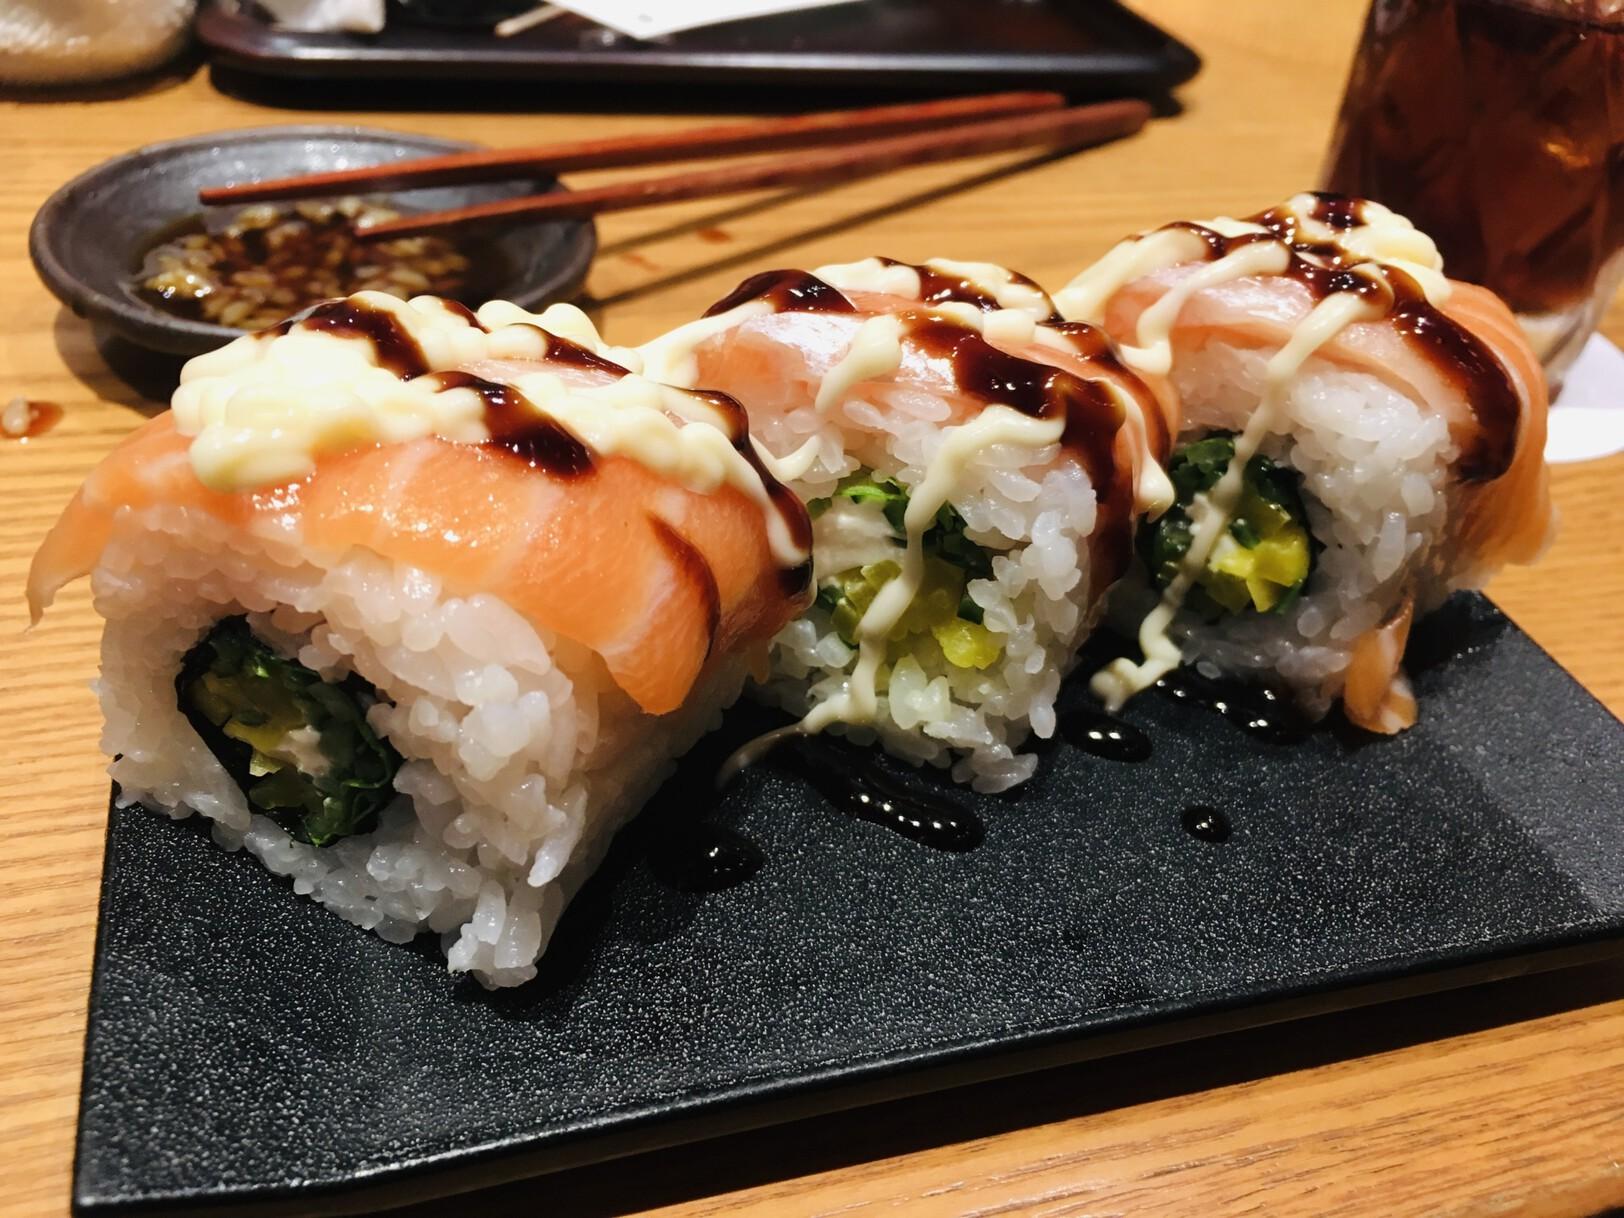 What to eat in Japan? Itamae Sushi Nishi-ShinjukuItamae Sushi Nishi-Shinjuku